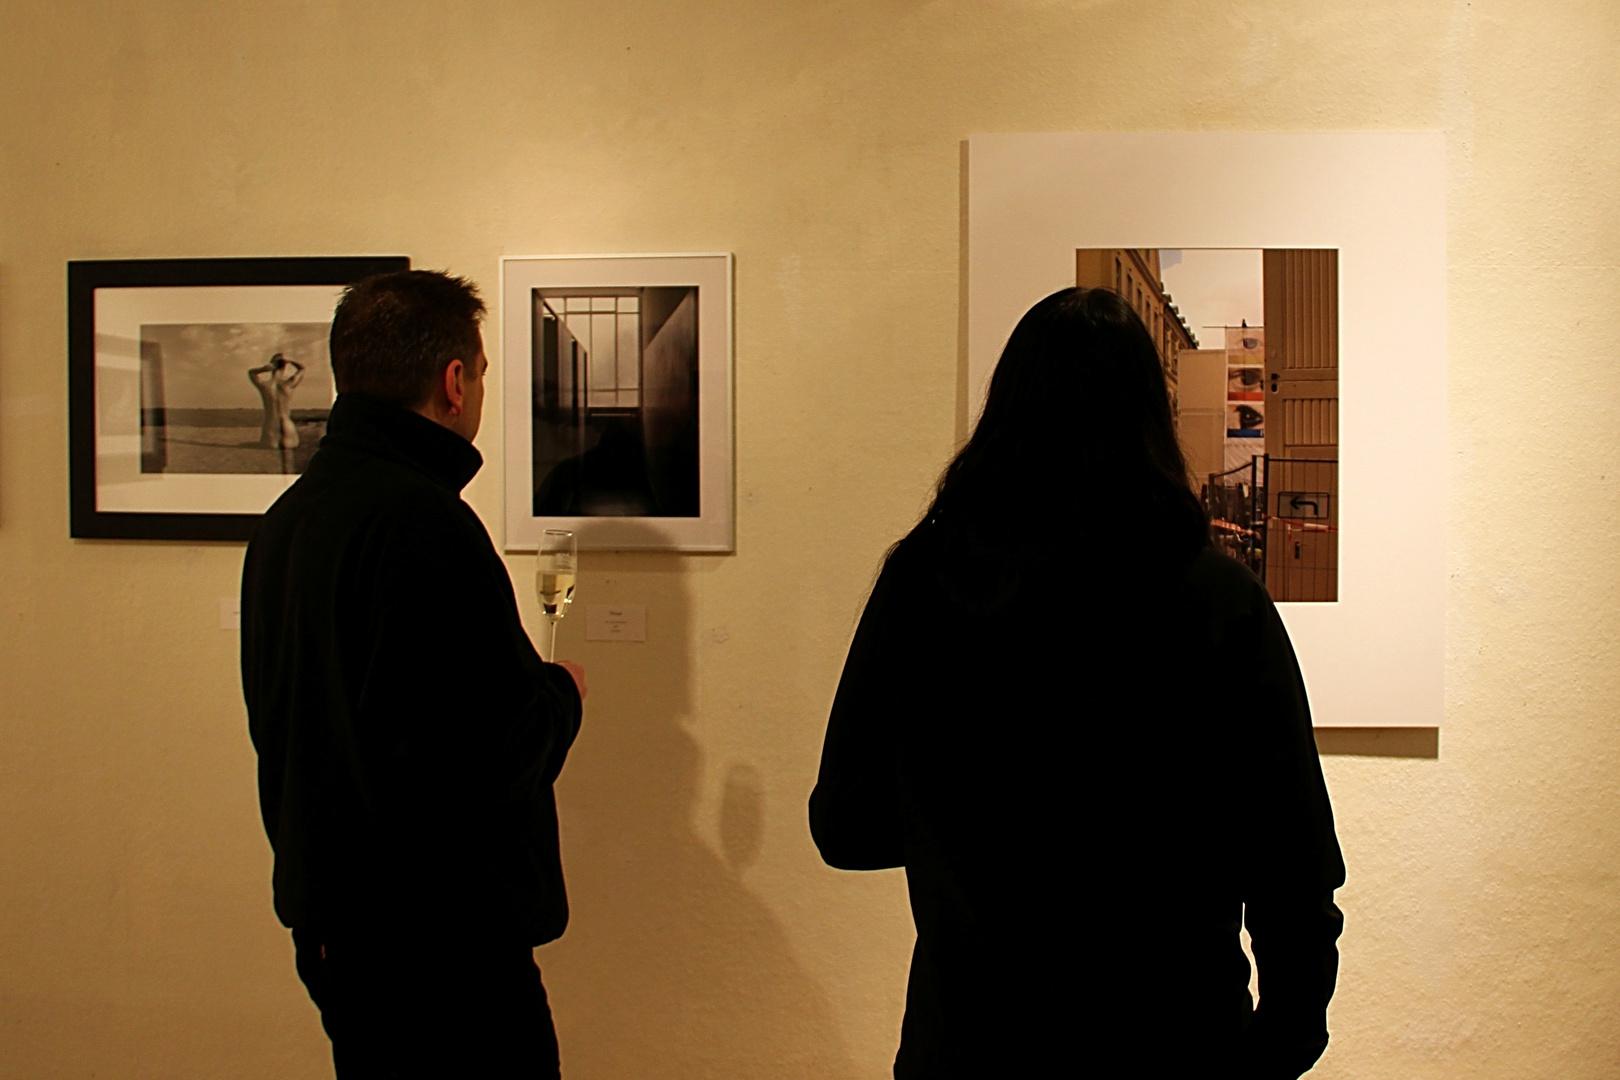 Fotoausstellung in Rastede